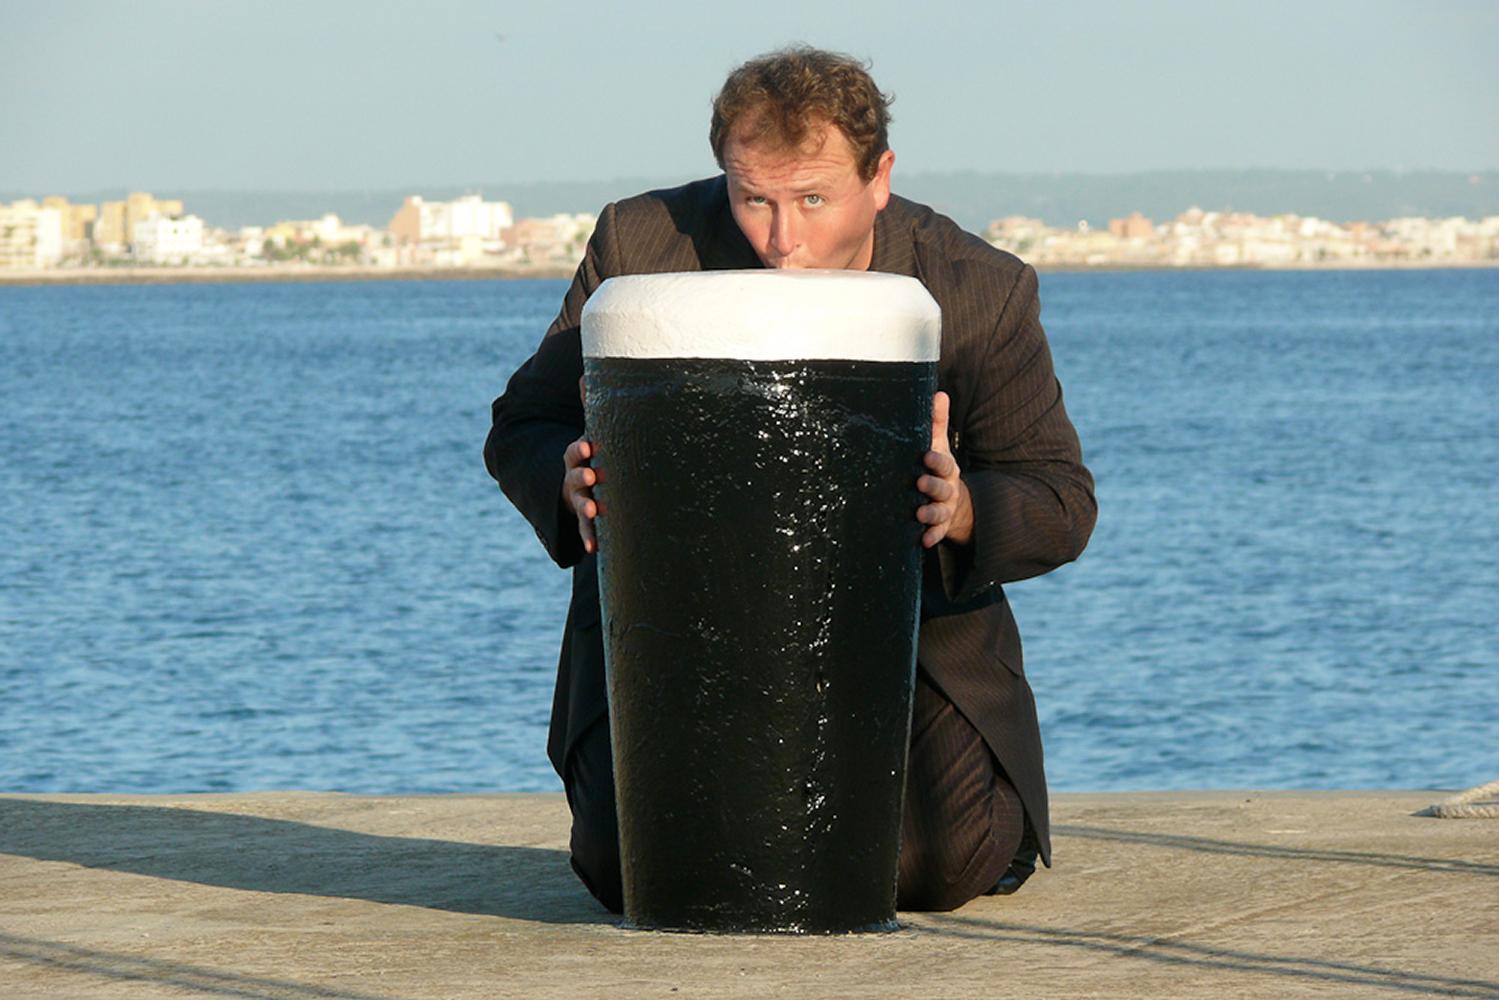 Palma De Mallorca, Spain. Drinking the giant pint of Guinness!